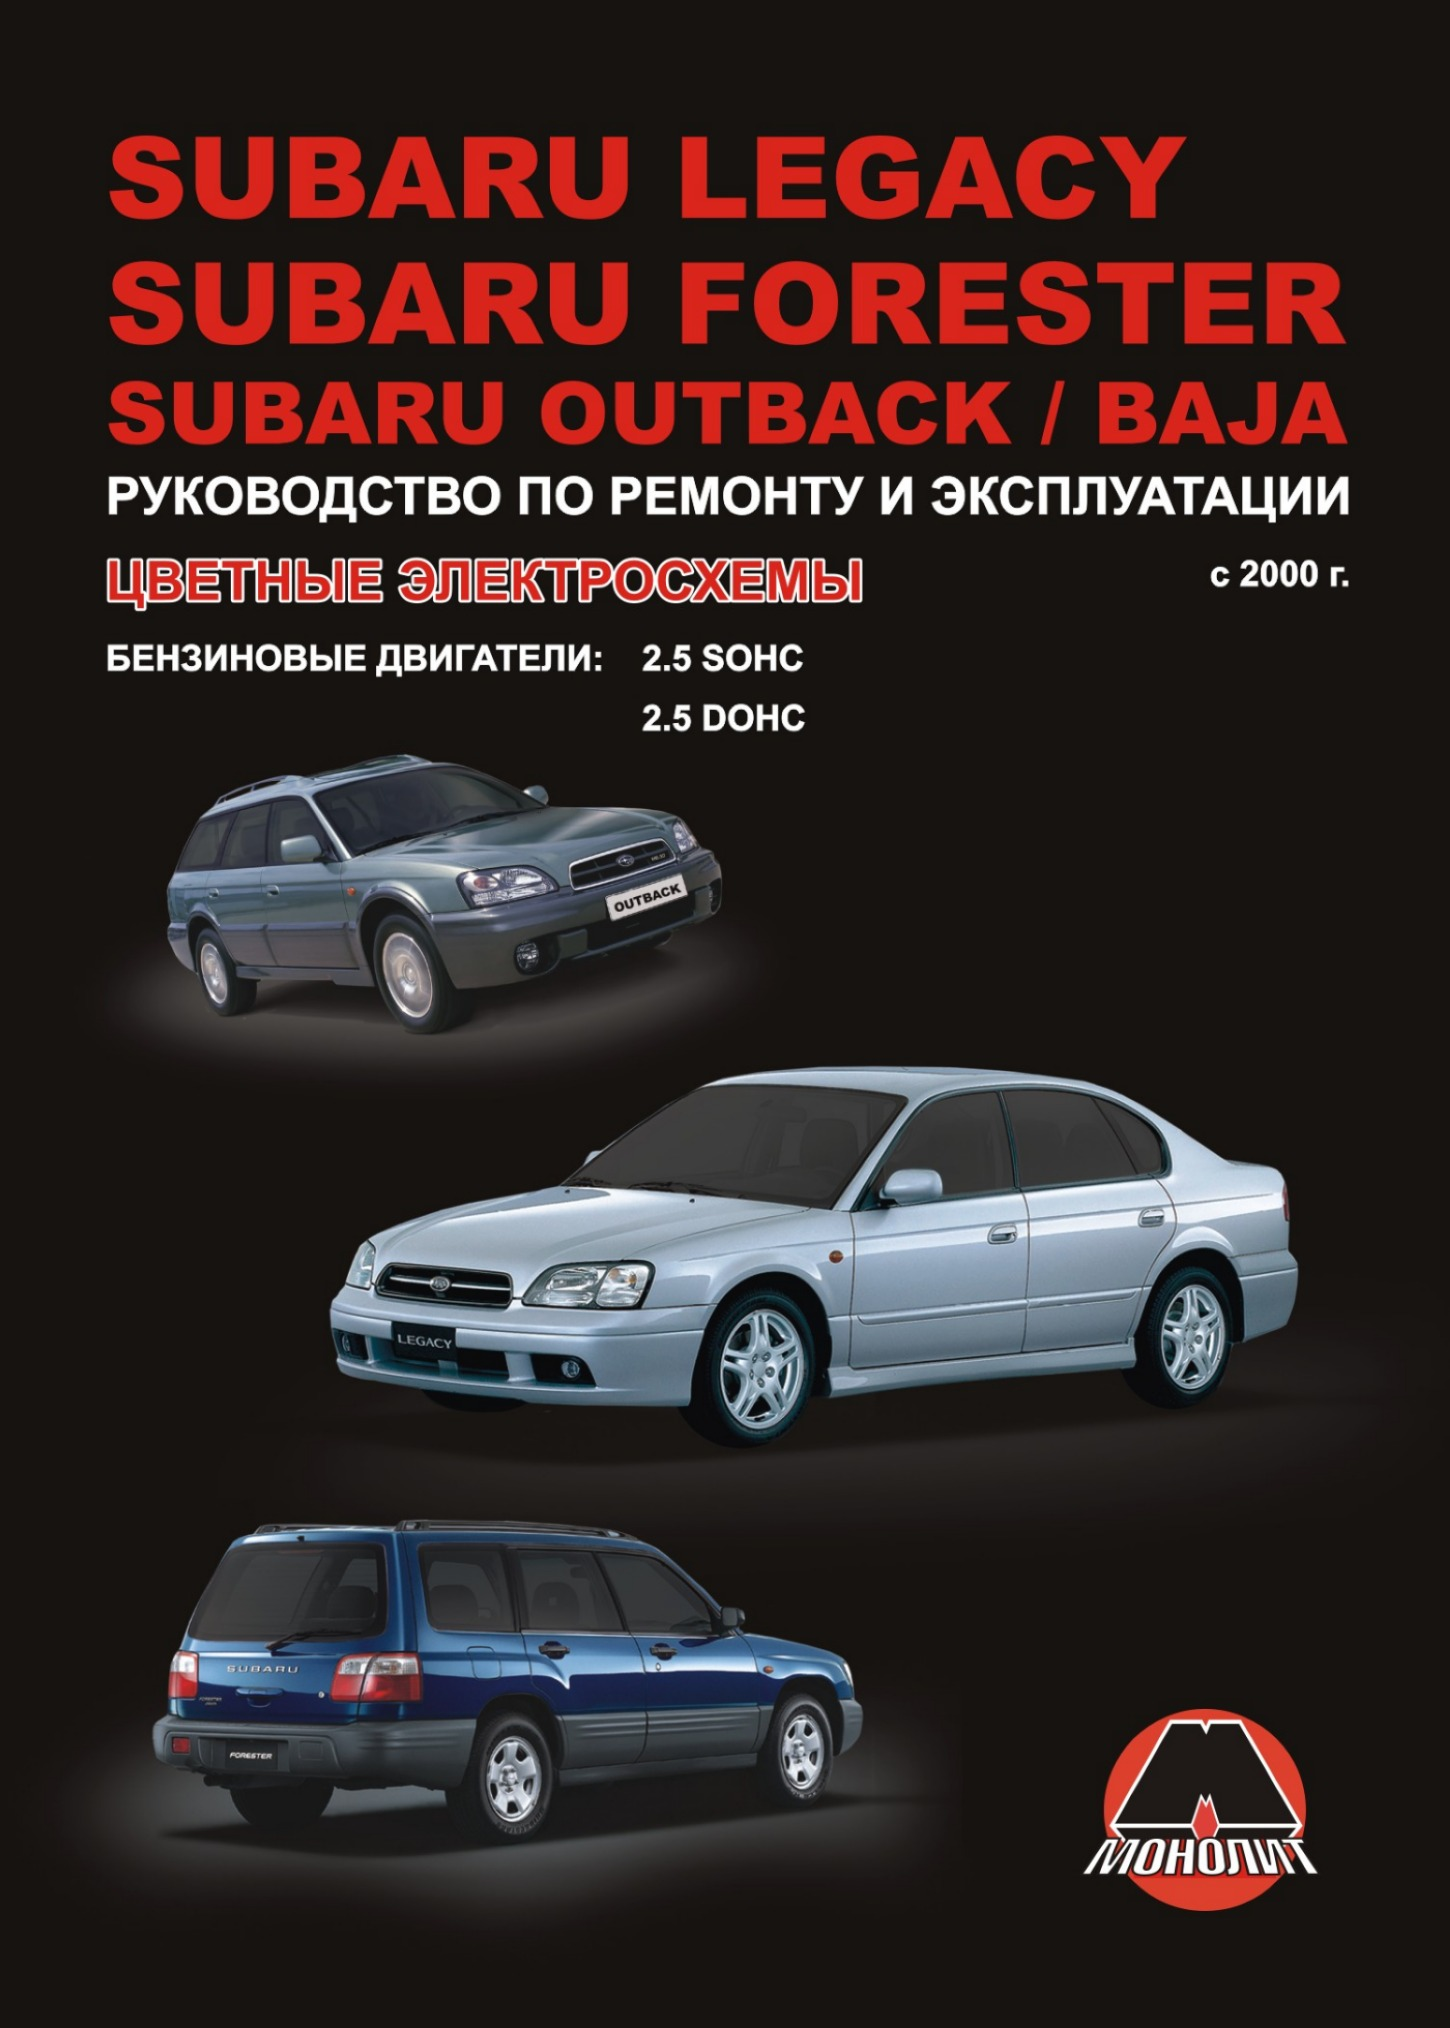 SUBARU LEGACY / LEGACY OUTBACK / FORESTER / BAJA с 2000 бензин Пособие по ремонту и эксплуатации